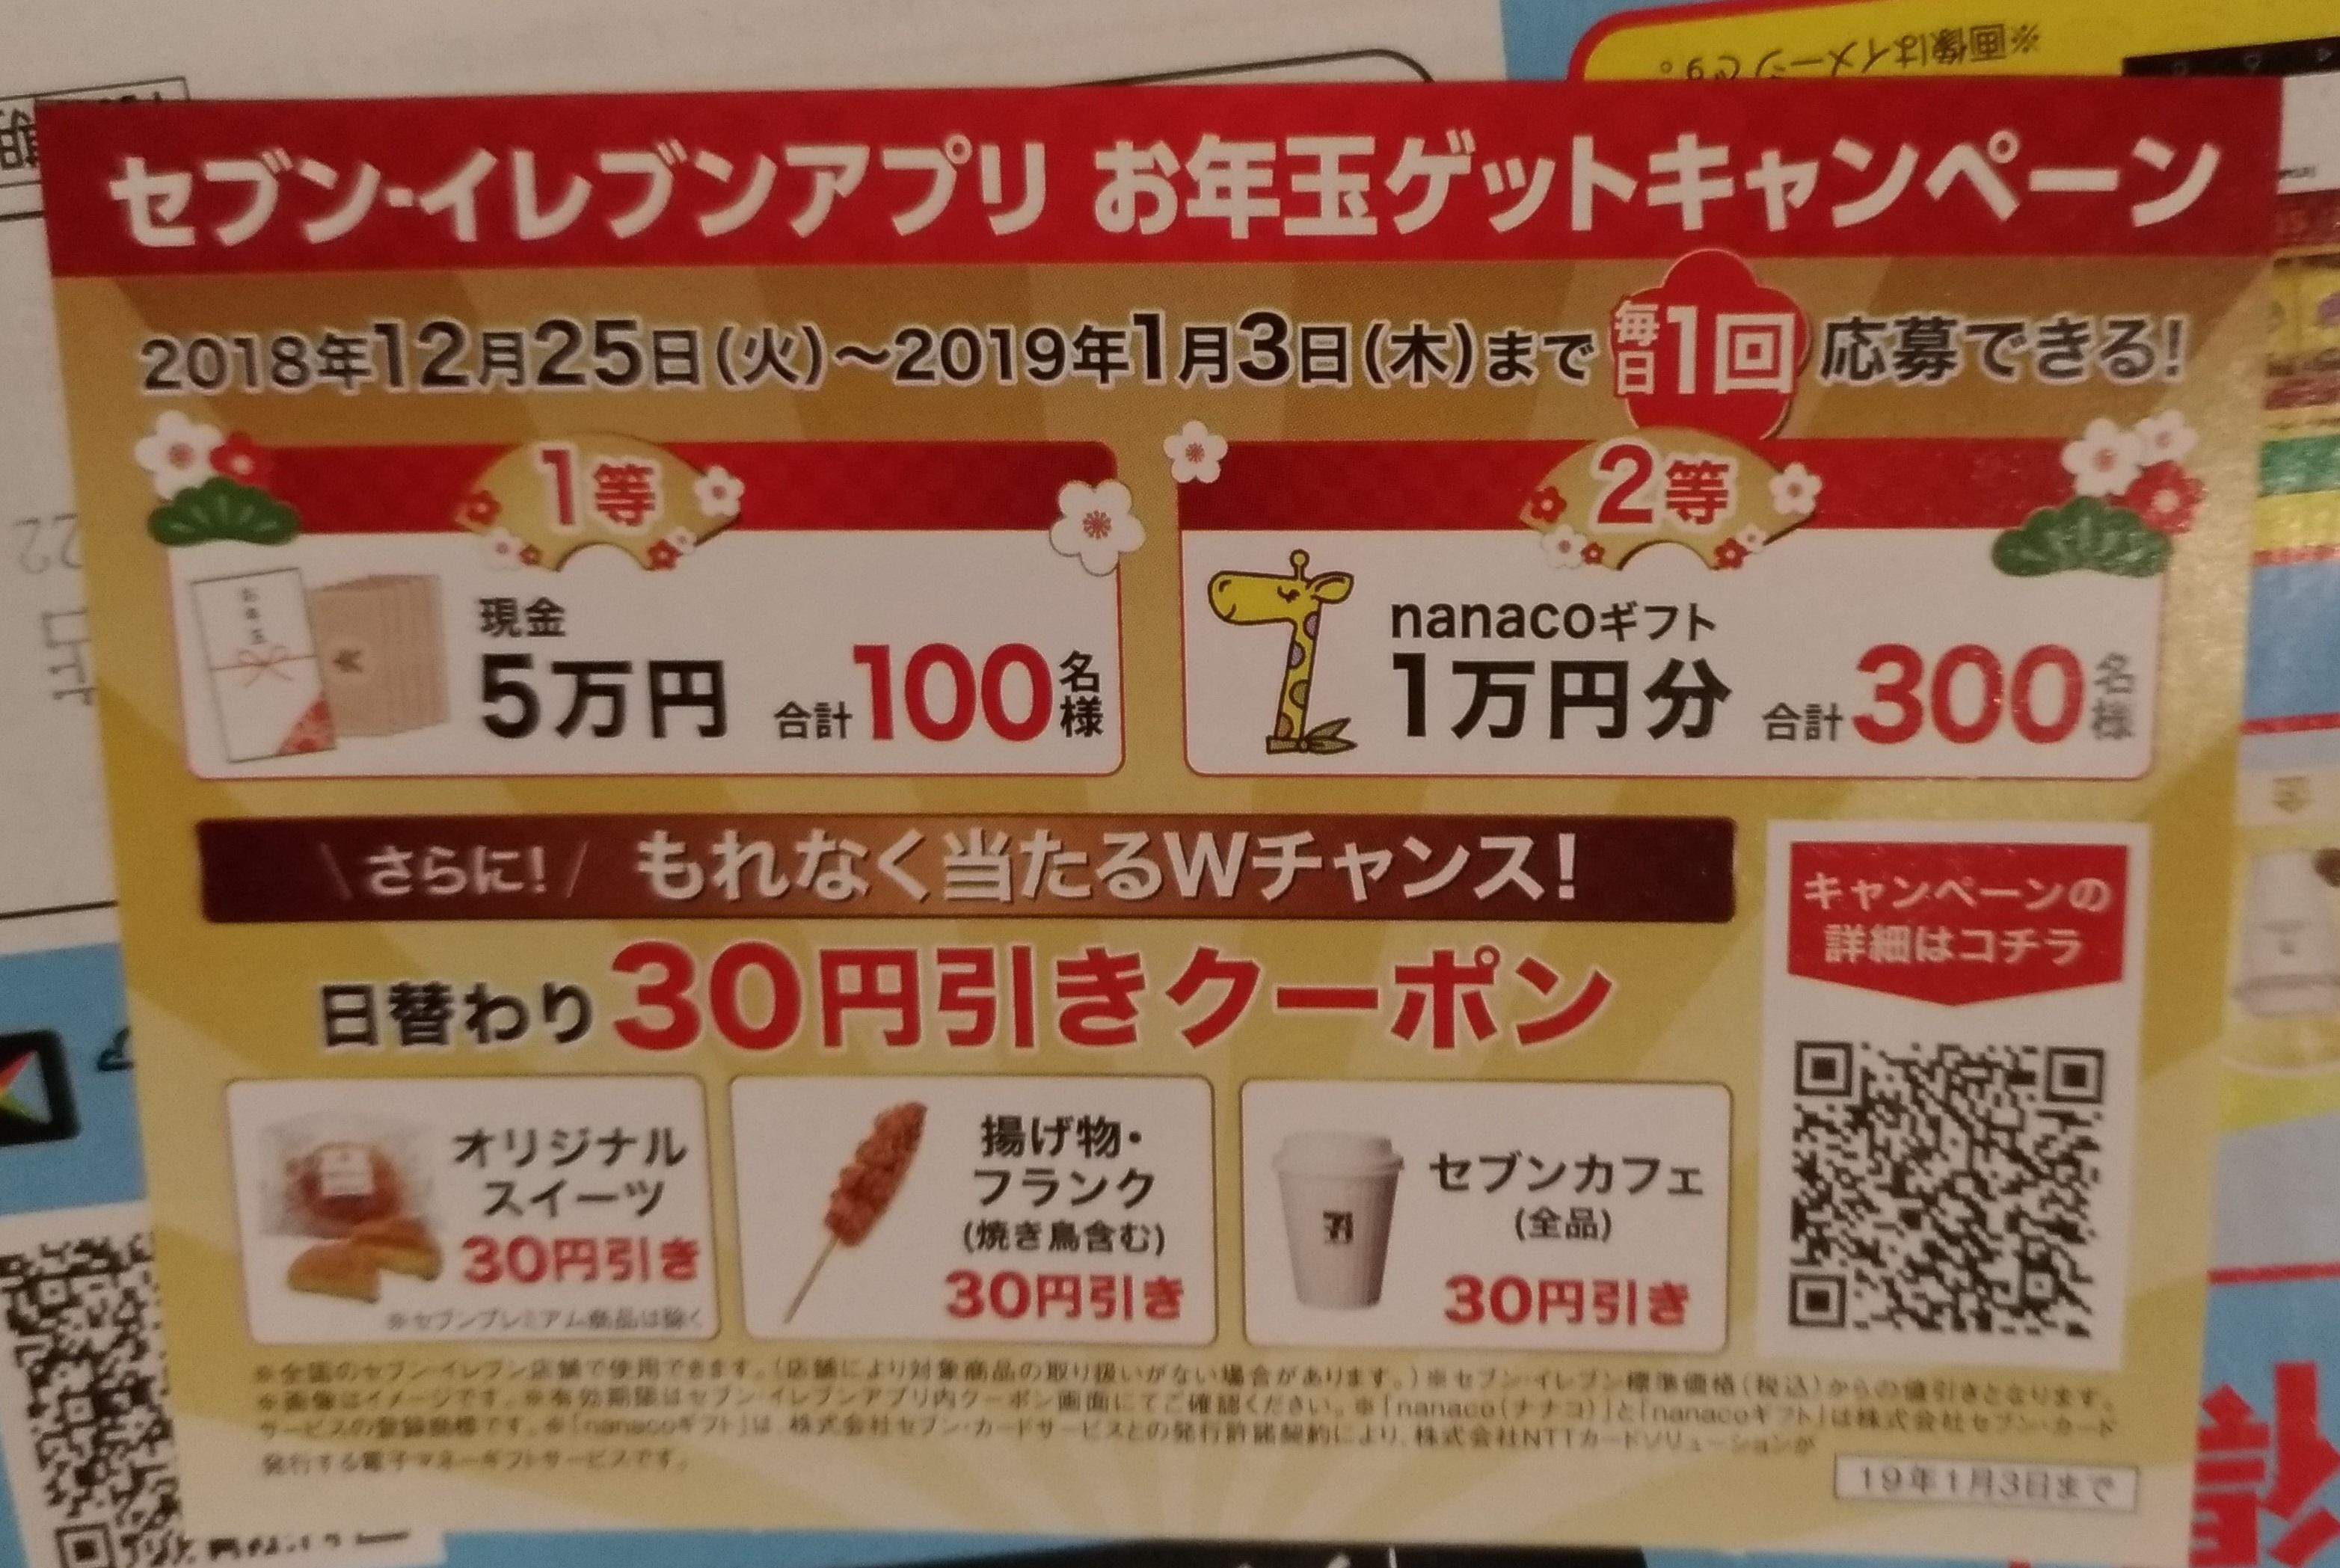 seven_app_campain2019.jpg